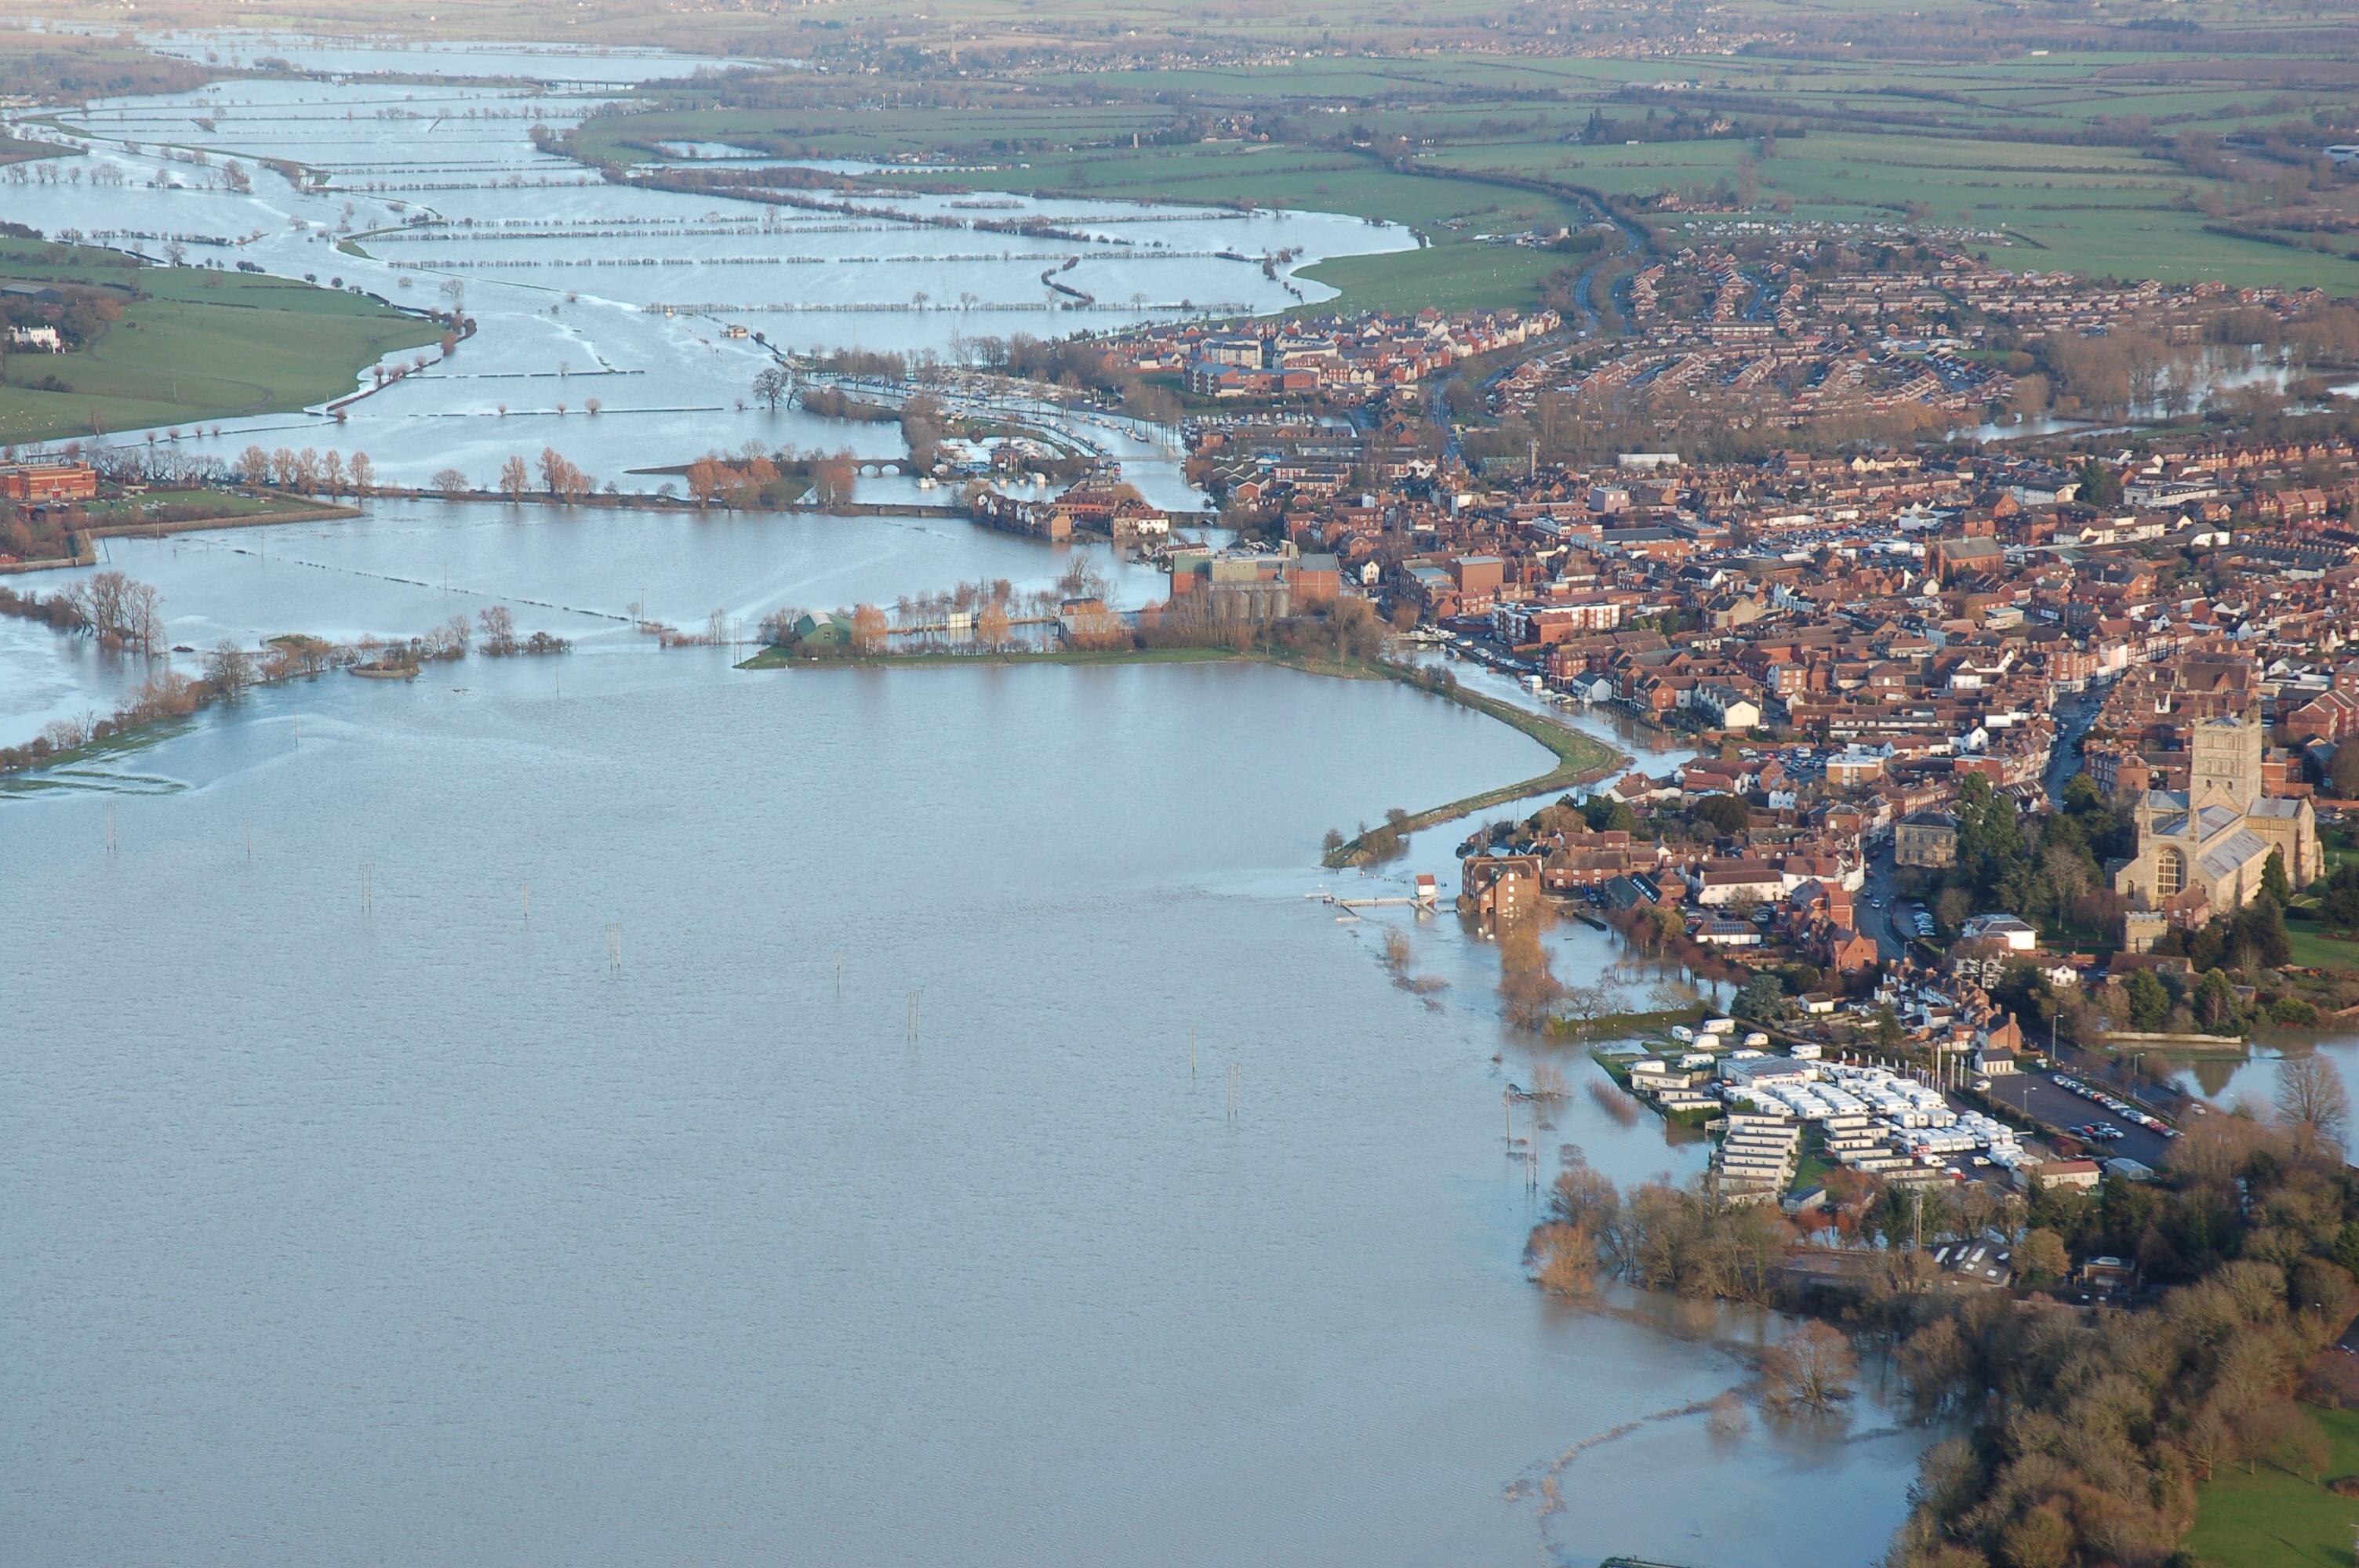 Flooded Tewkesbury